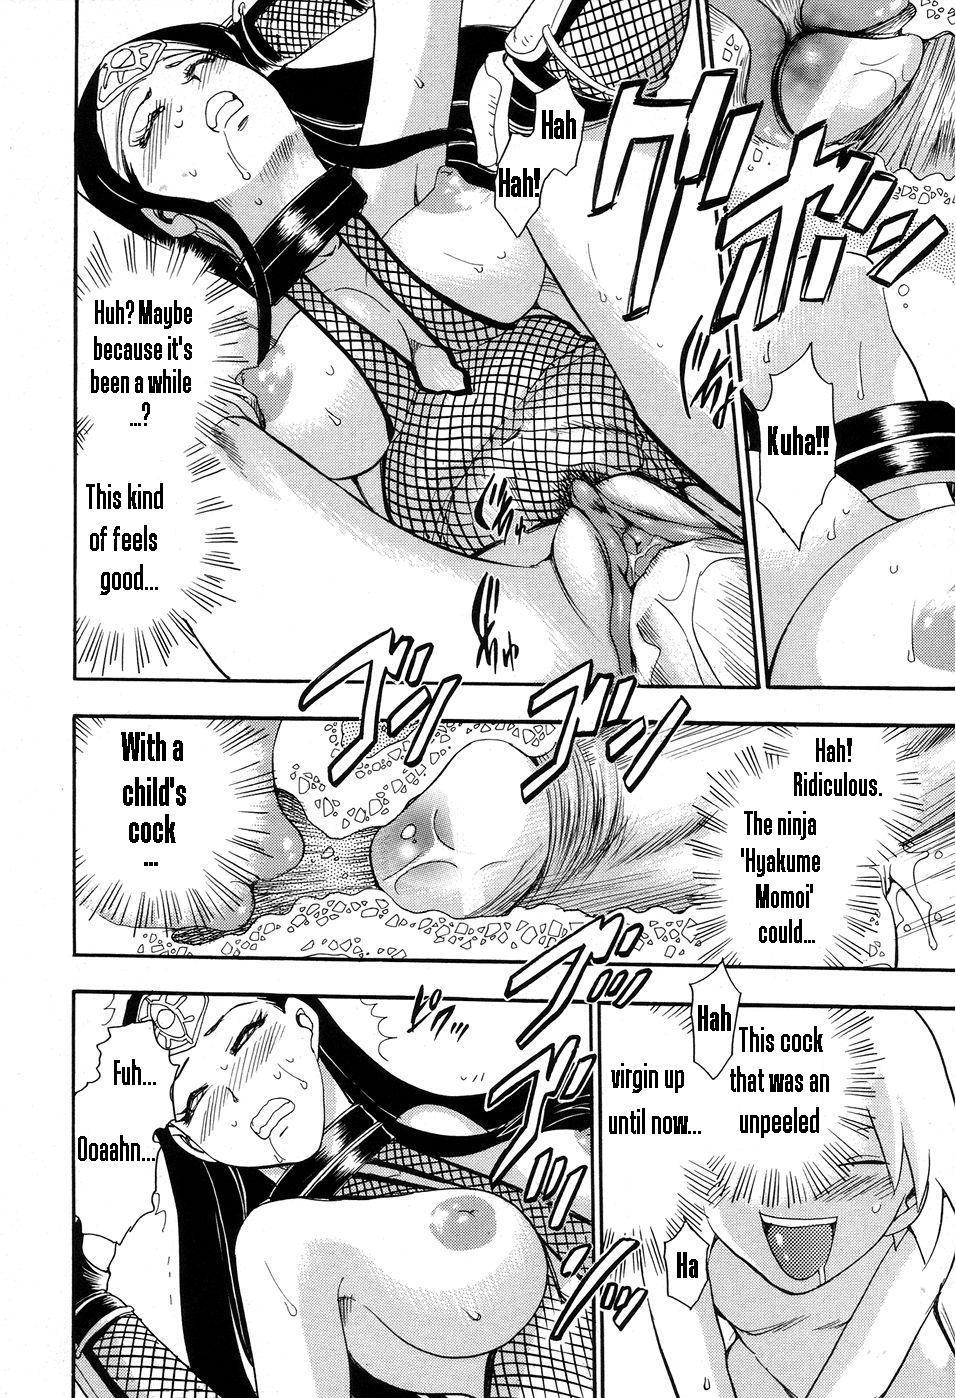 Maranosuke Chapter 1 25